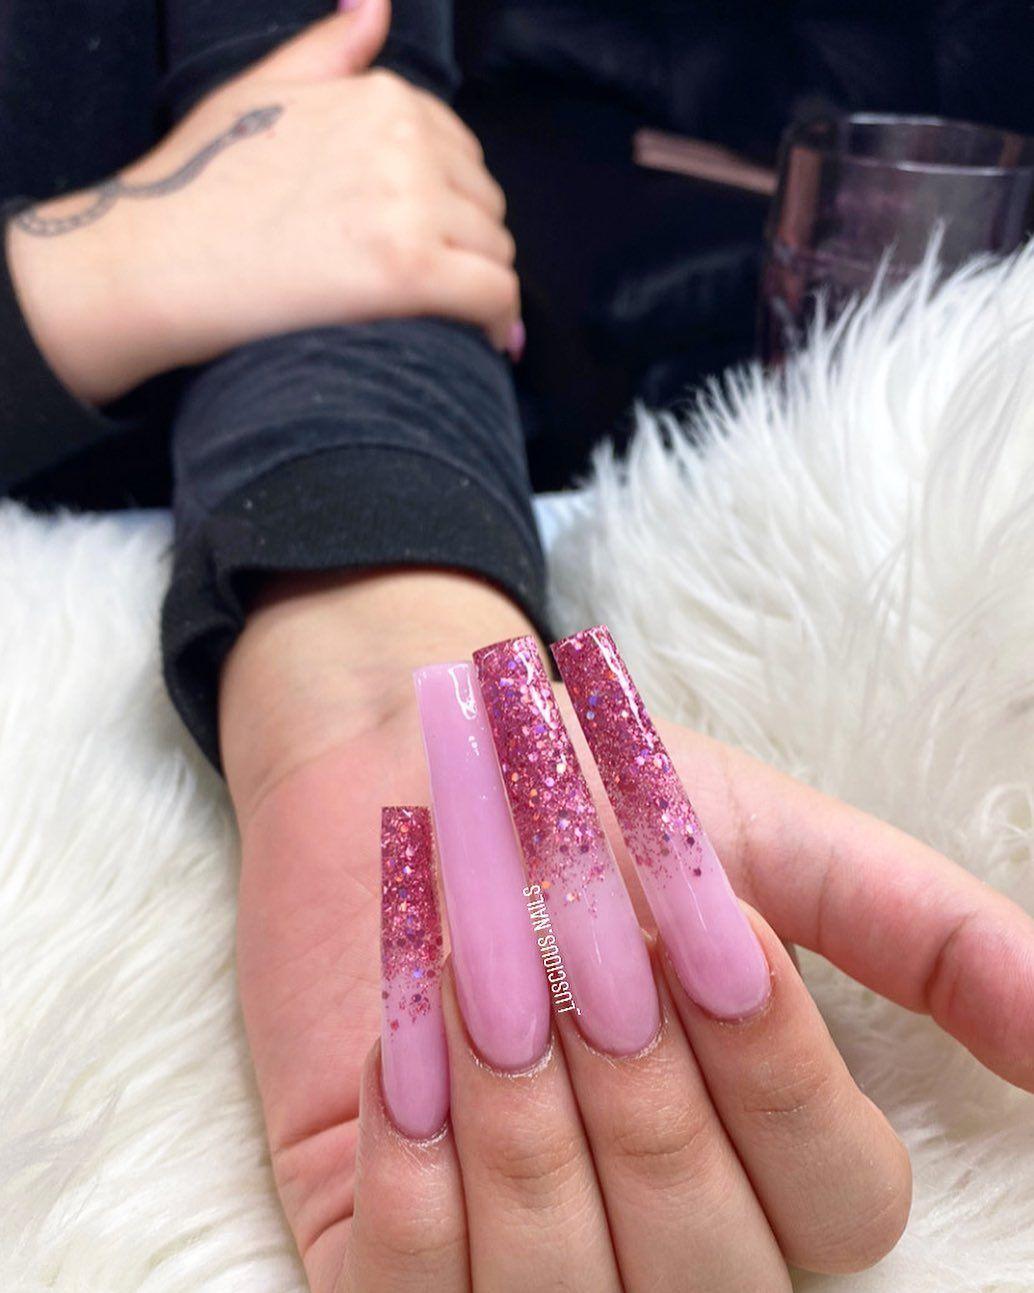 Nail Tech On Instagram Nails Manhattan Harlem Manhattannailtech Harlemnailtech Nyc Ny Nycnailtech Nynailtech Gold In 2020 Luxury Nails Long Nails Nails